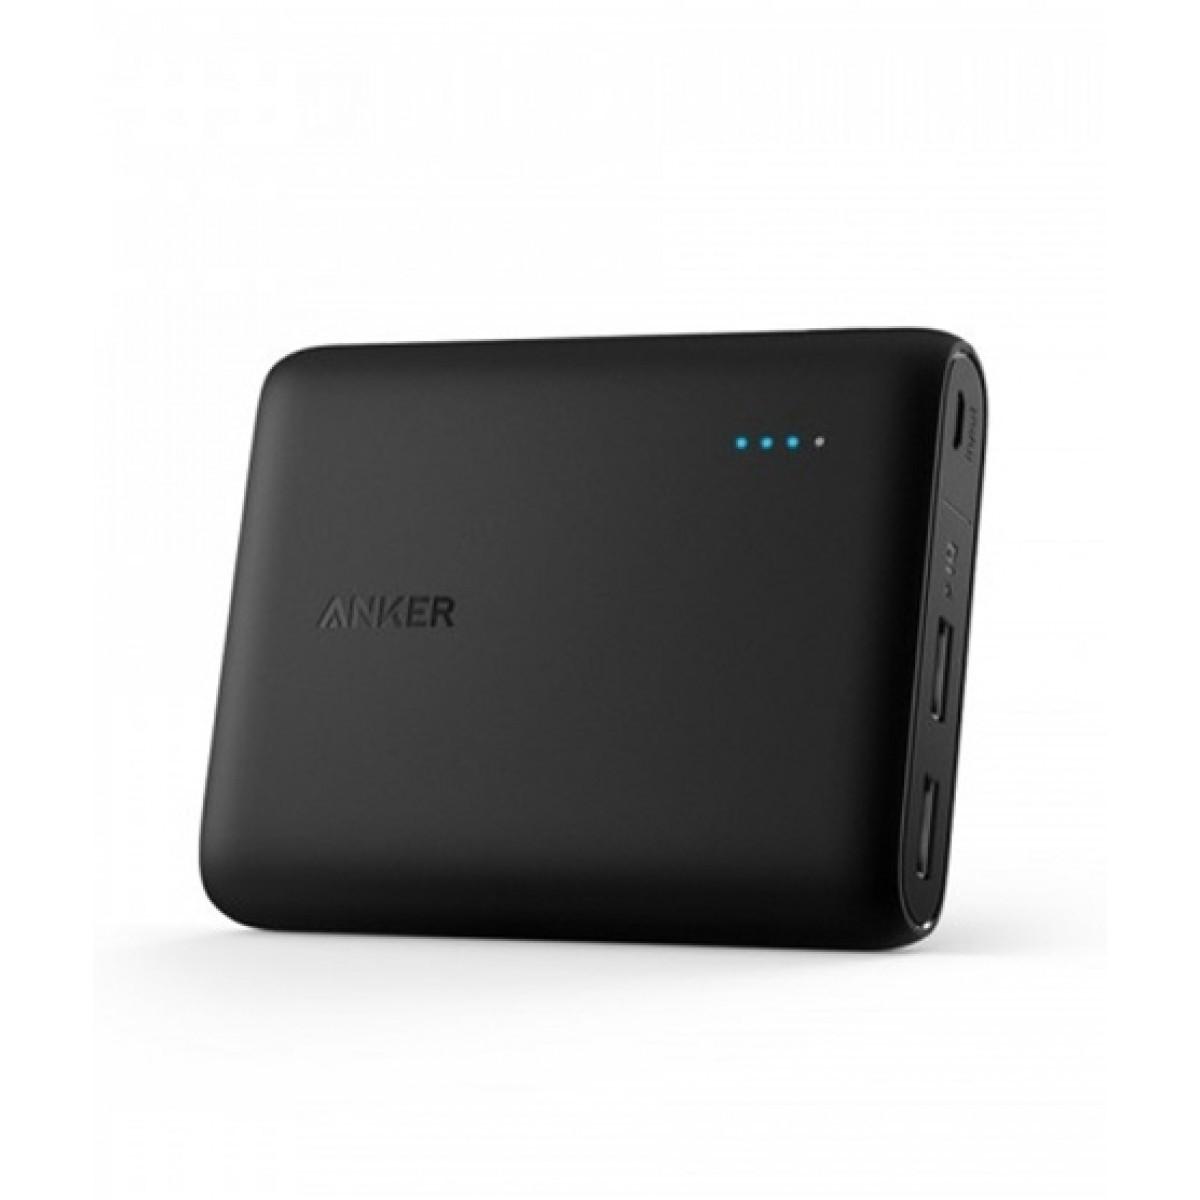 Anker PowerCore 10400mAh External Battery Pack Black